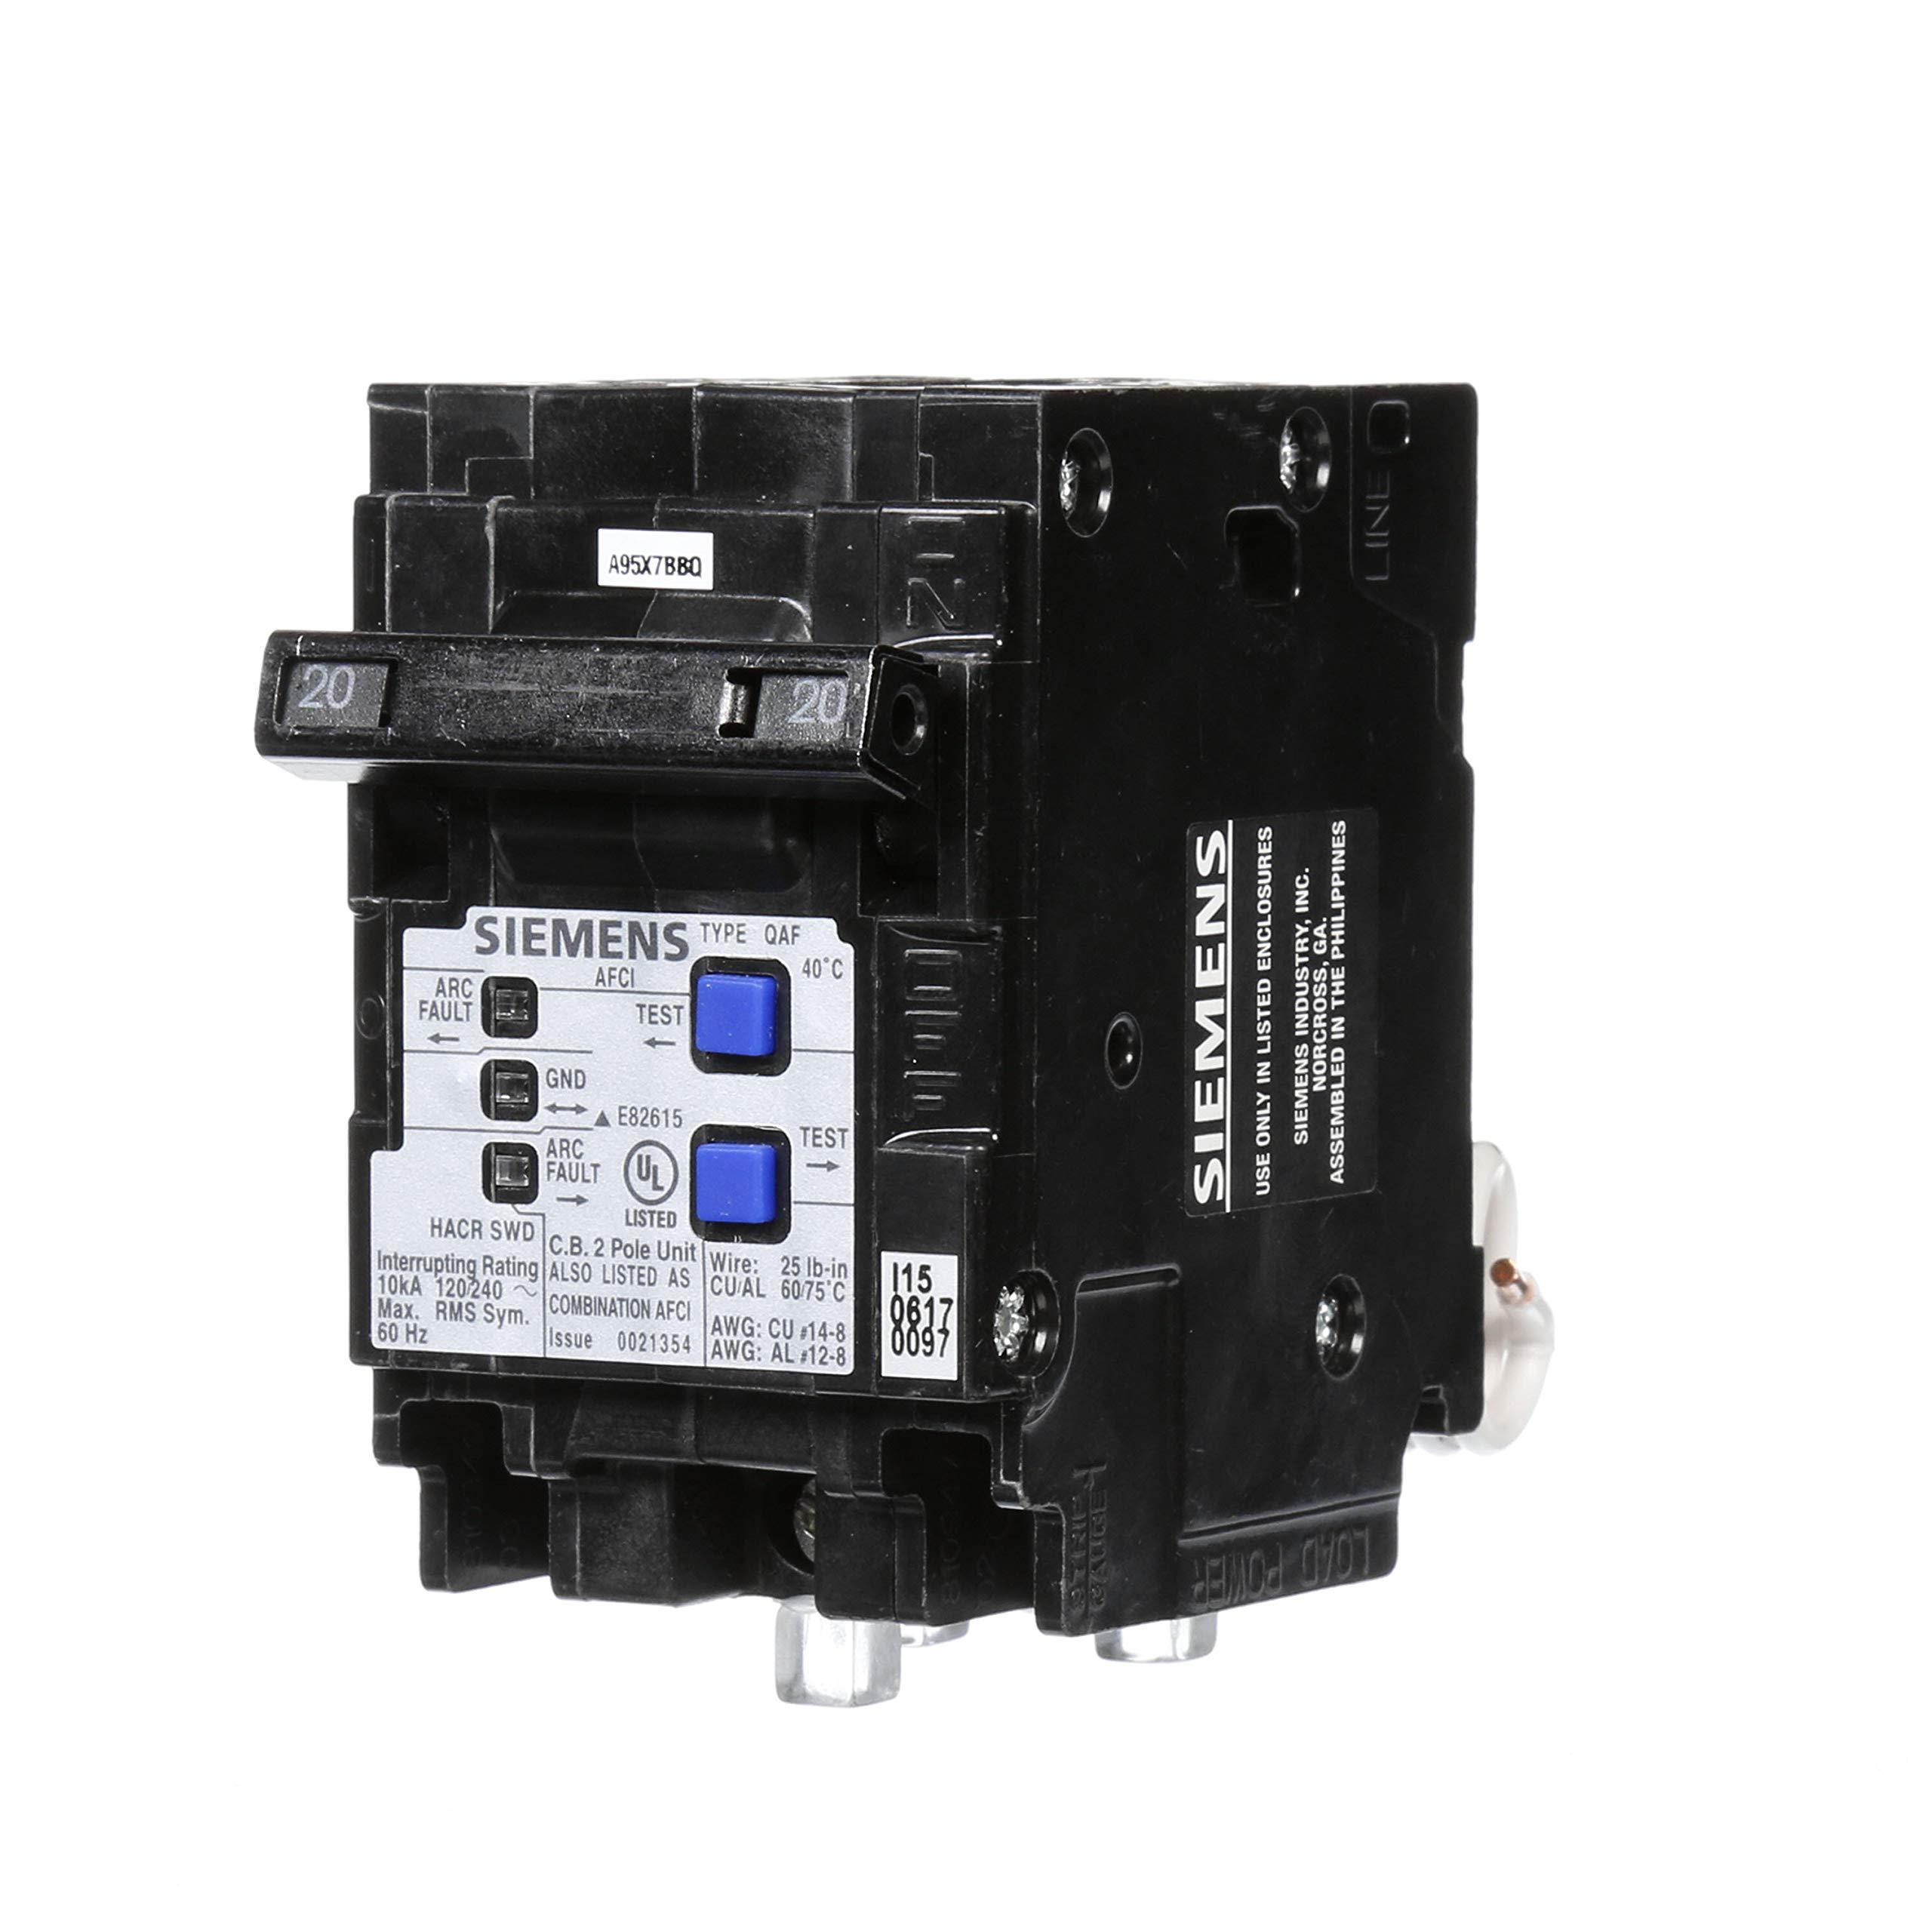 Siemens Q215AFCP 2-Pole 120-Volt combination type arc fault circuit interrupter by SIEMENS (Image #1)